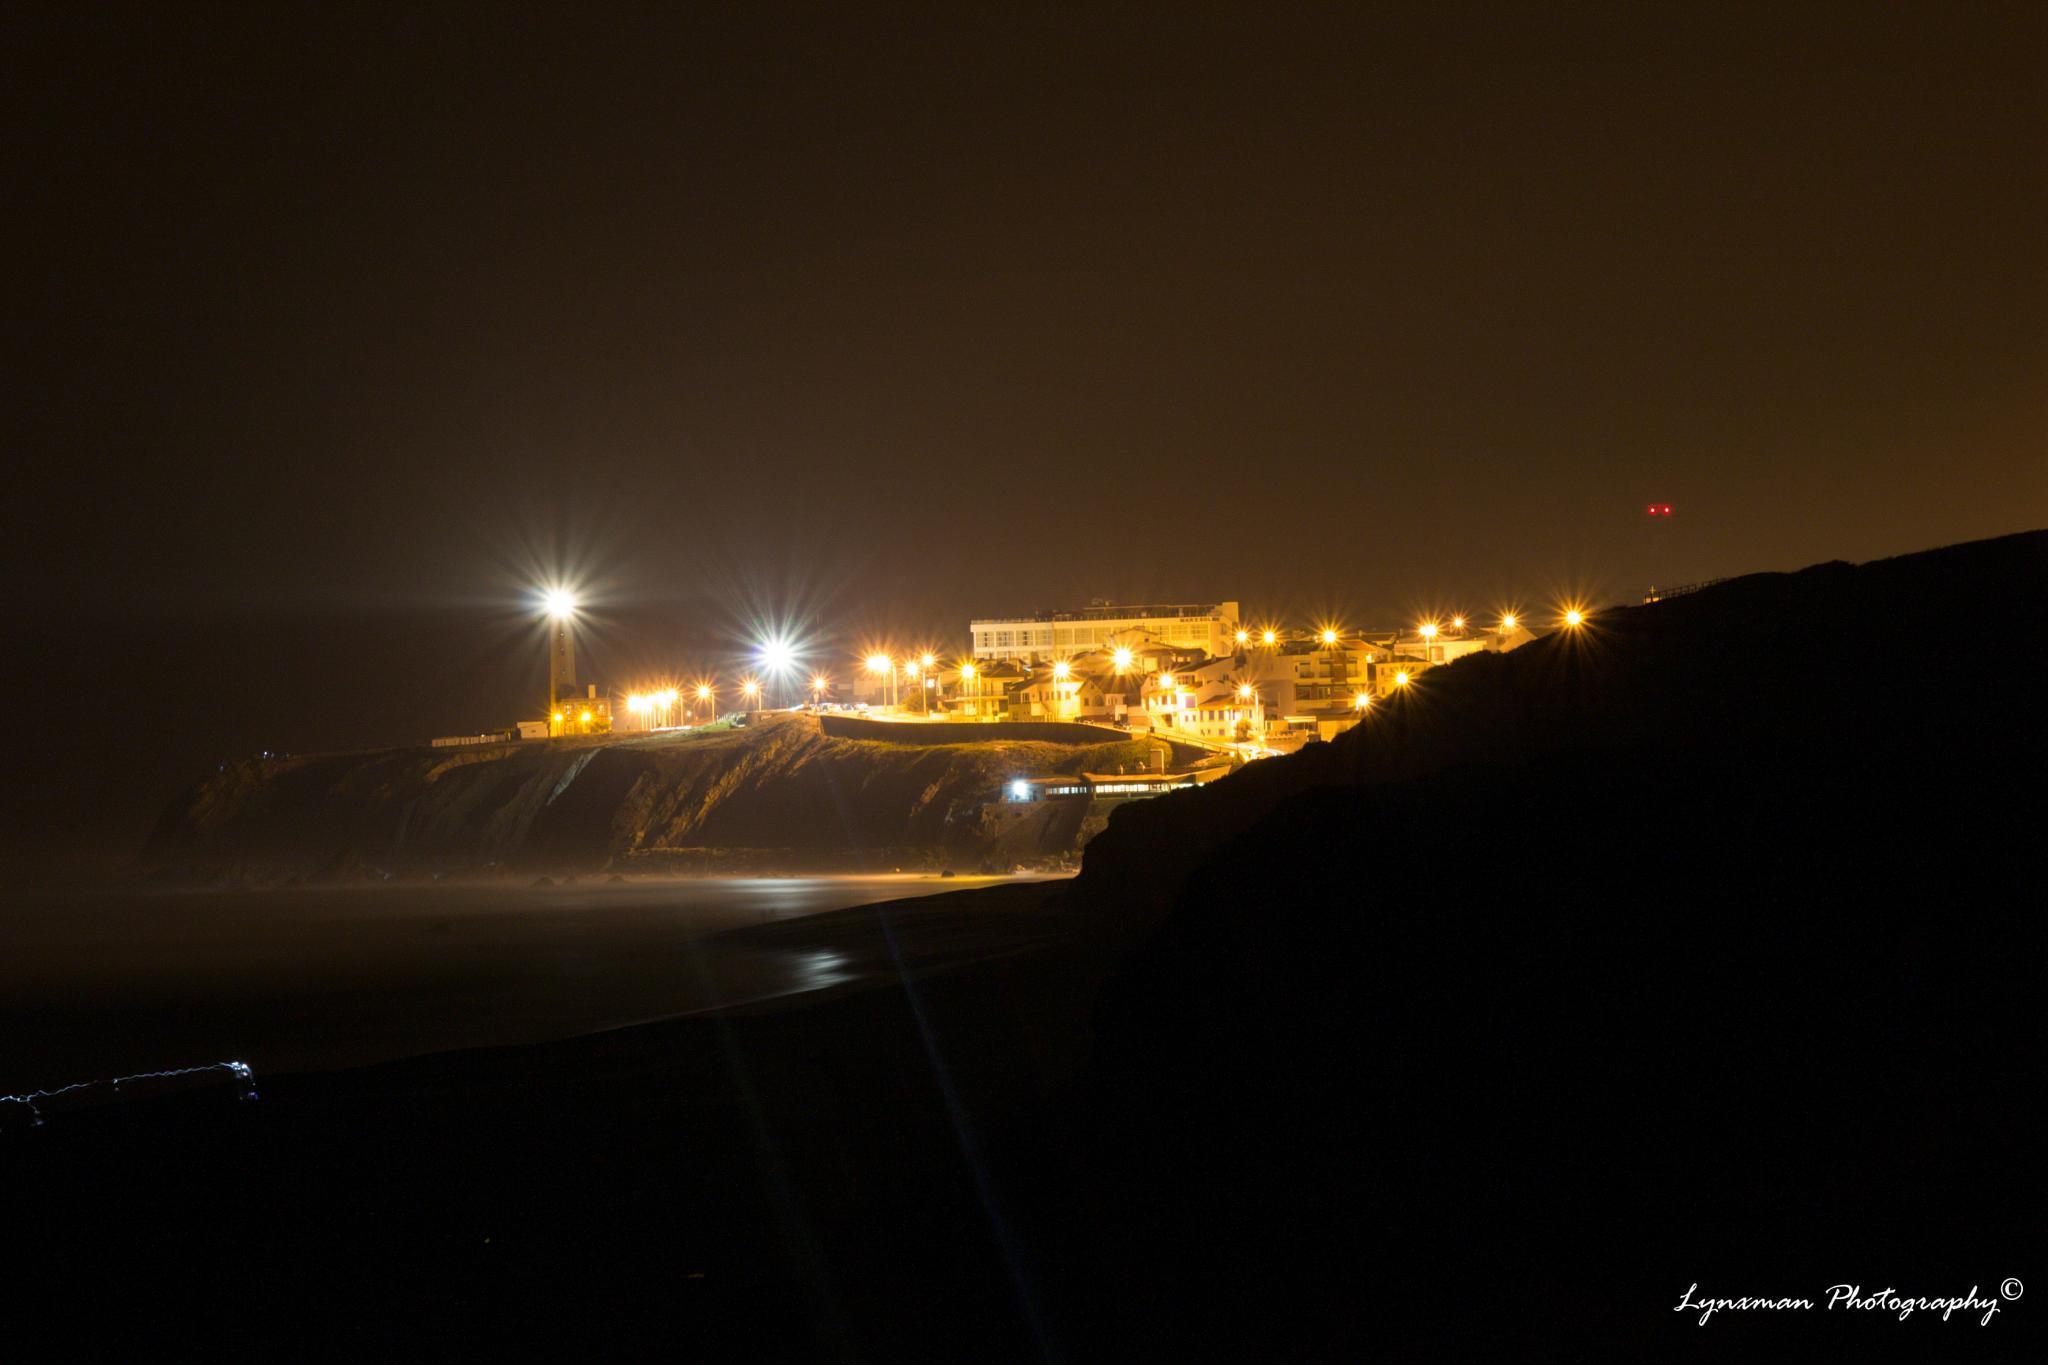 Beach of São Pedro de Moel at night by lynxmanphotography